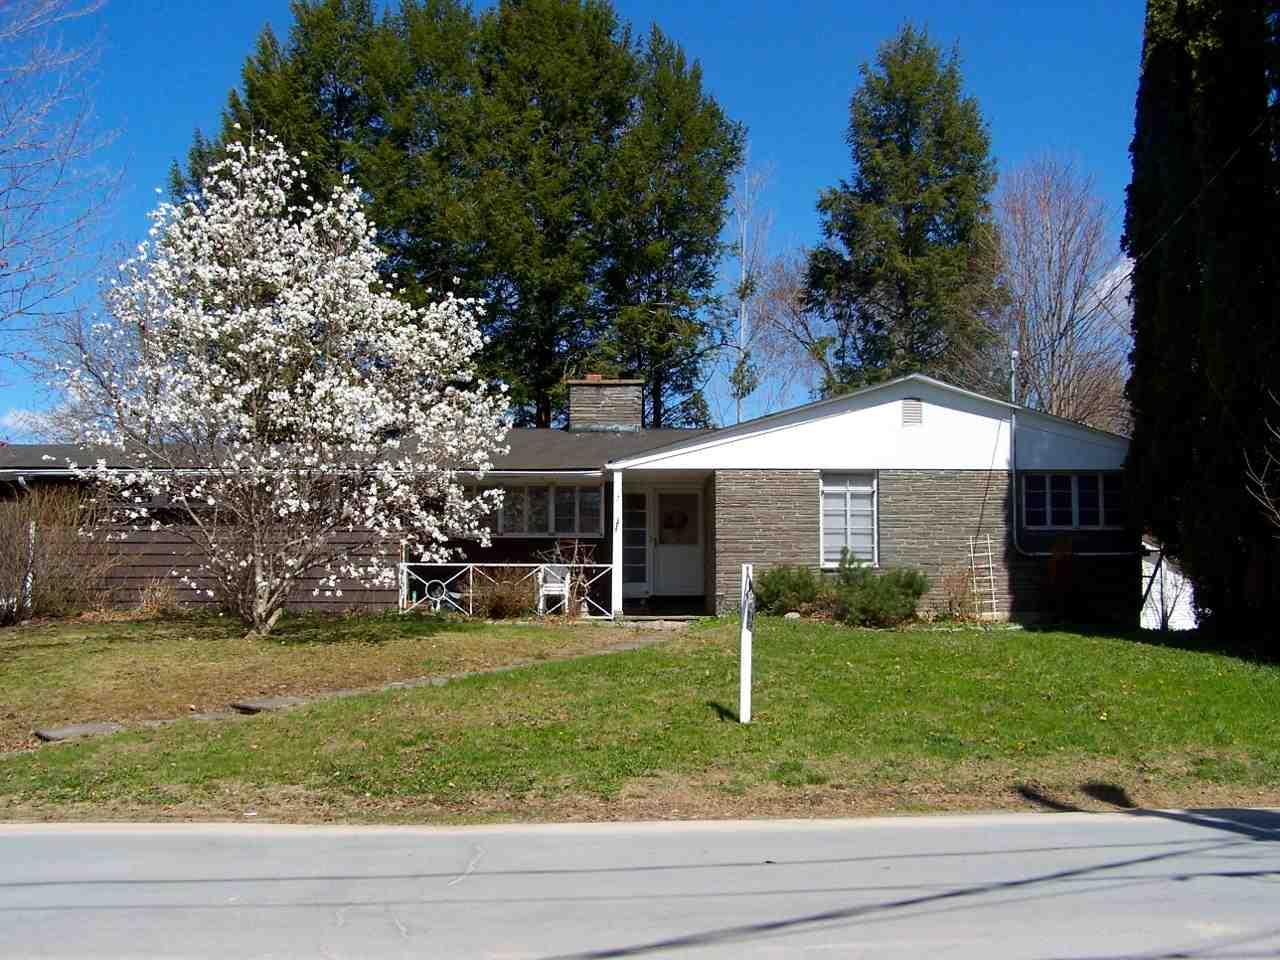 Real Estate for Sale, ListingId: 33184904, Livingston Manor,NY12758